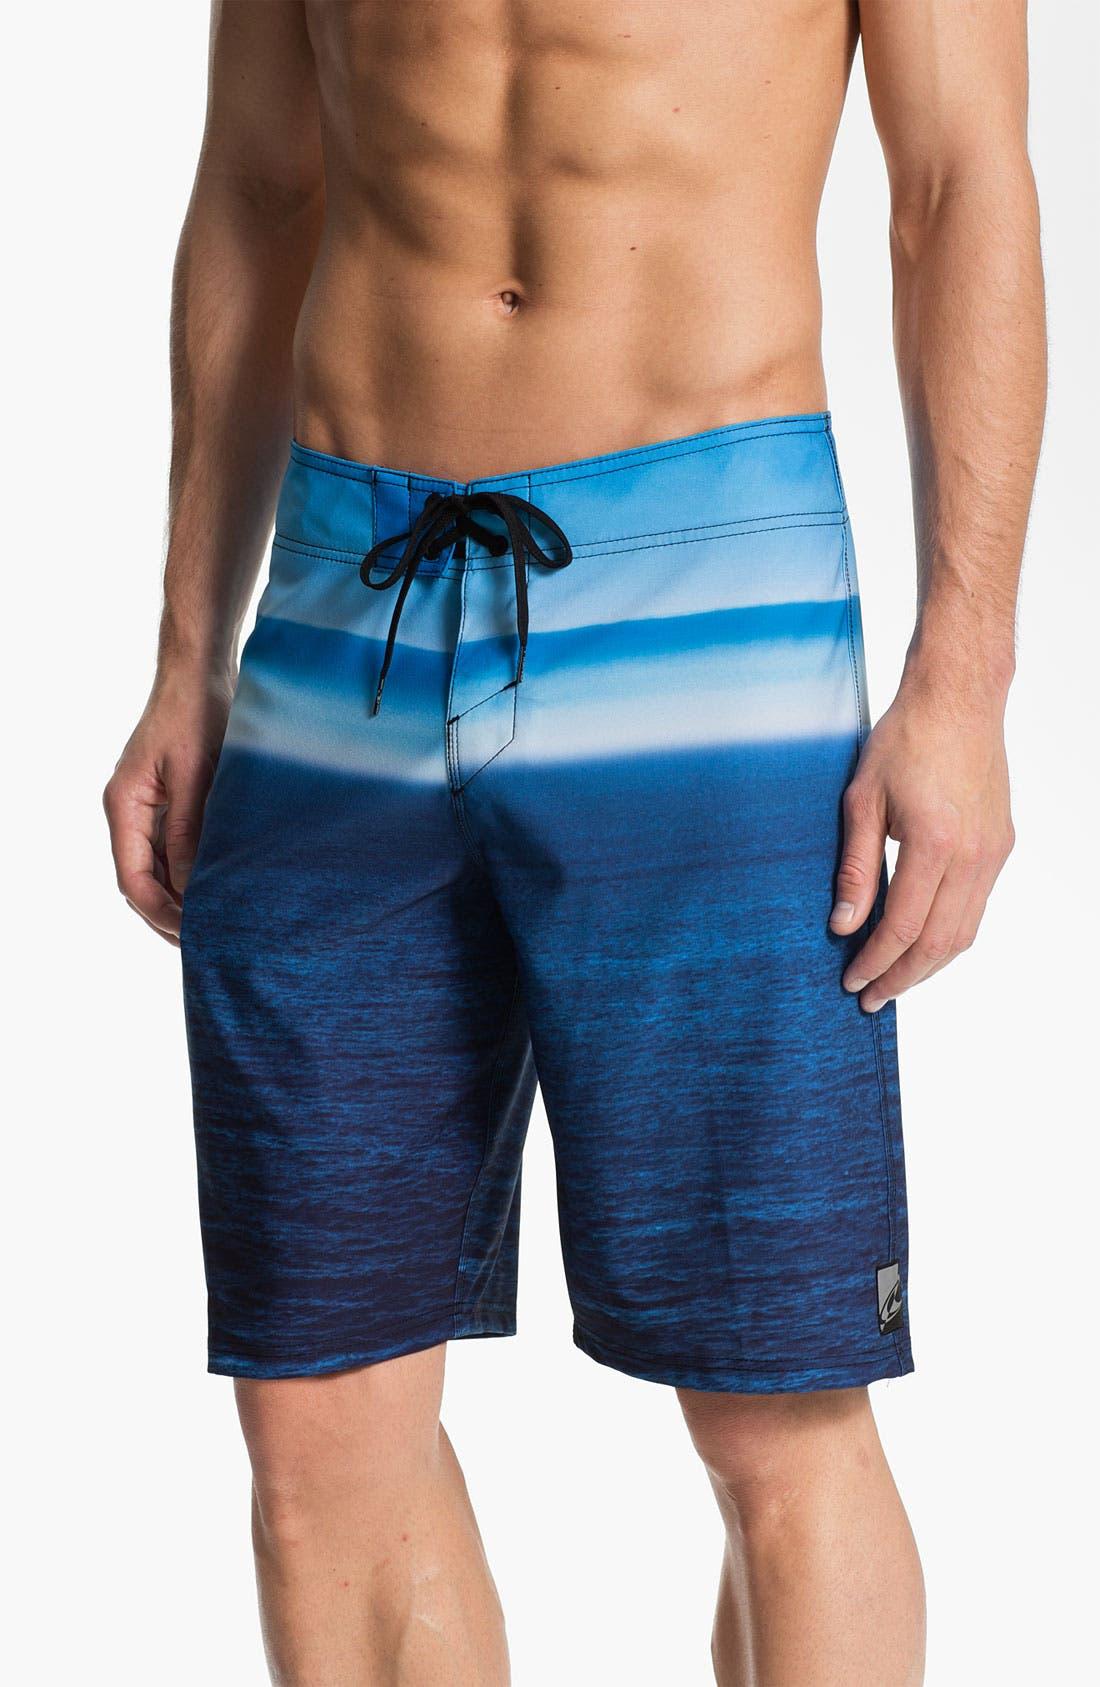 Alternate Image 1 Selected - O'Neill 'Fogbank' Board Shorts